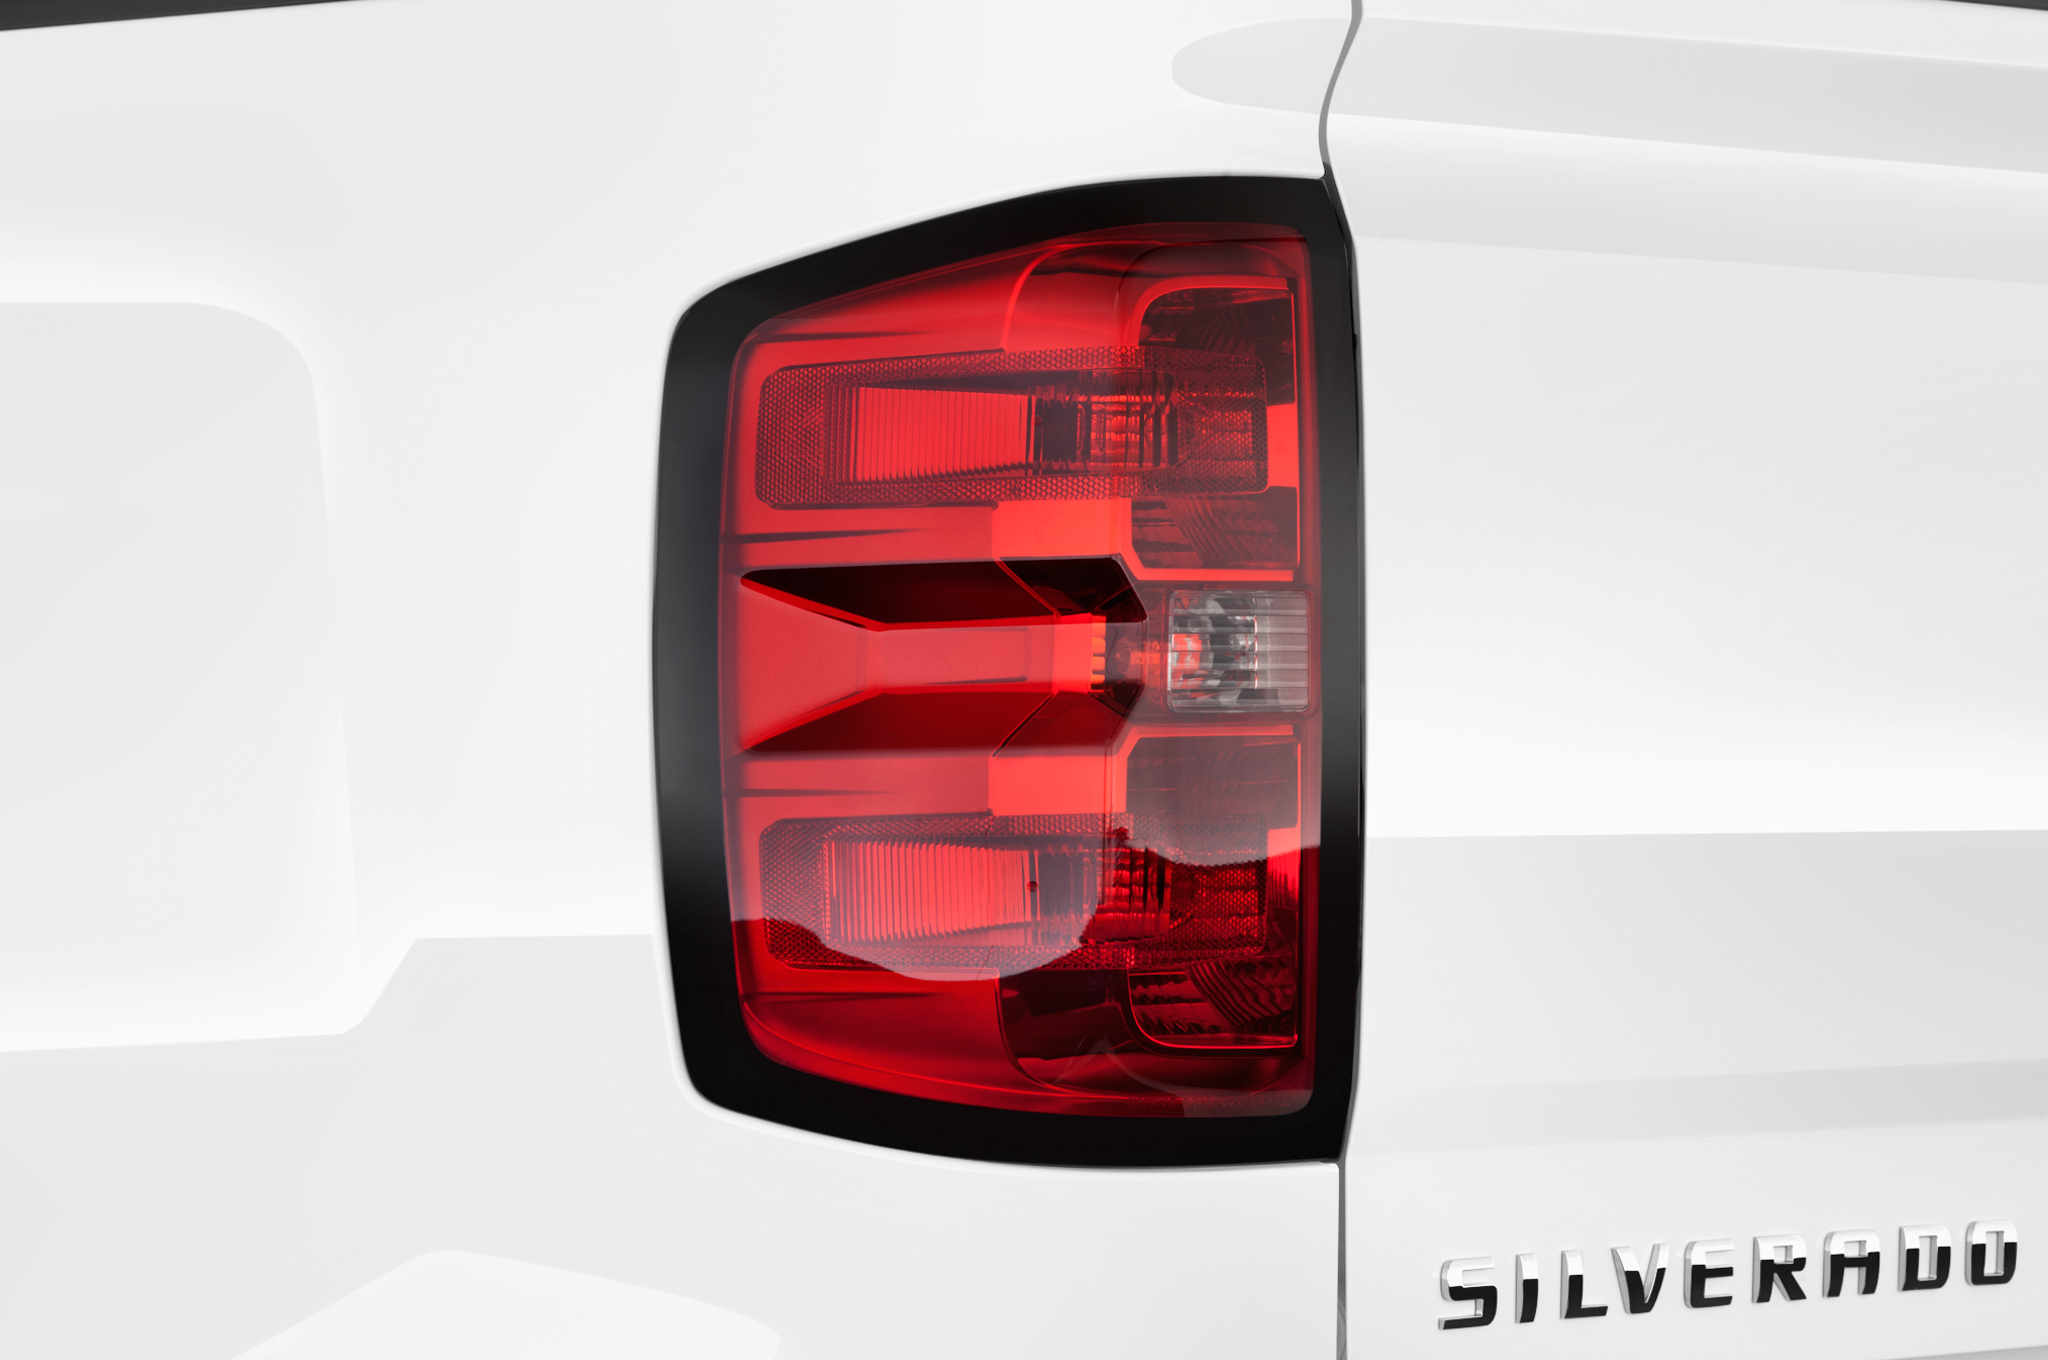 2016 Chevrolet Silverado, GMC Sierra Add eist Hybrid ... on gmc canyon tail light wiring diagram, cadillac srx tail light wiring diagram, 2014 gmc sierra fuse diagram, toyota camry tail light wiring diagram,